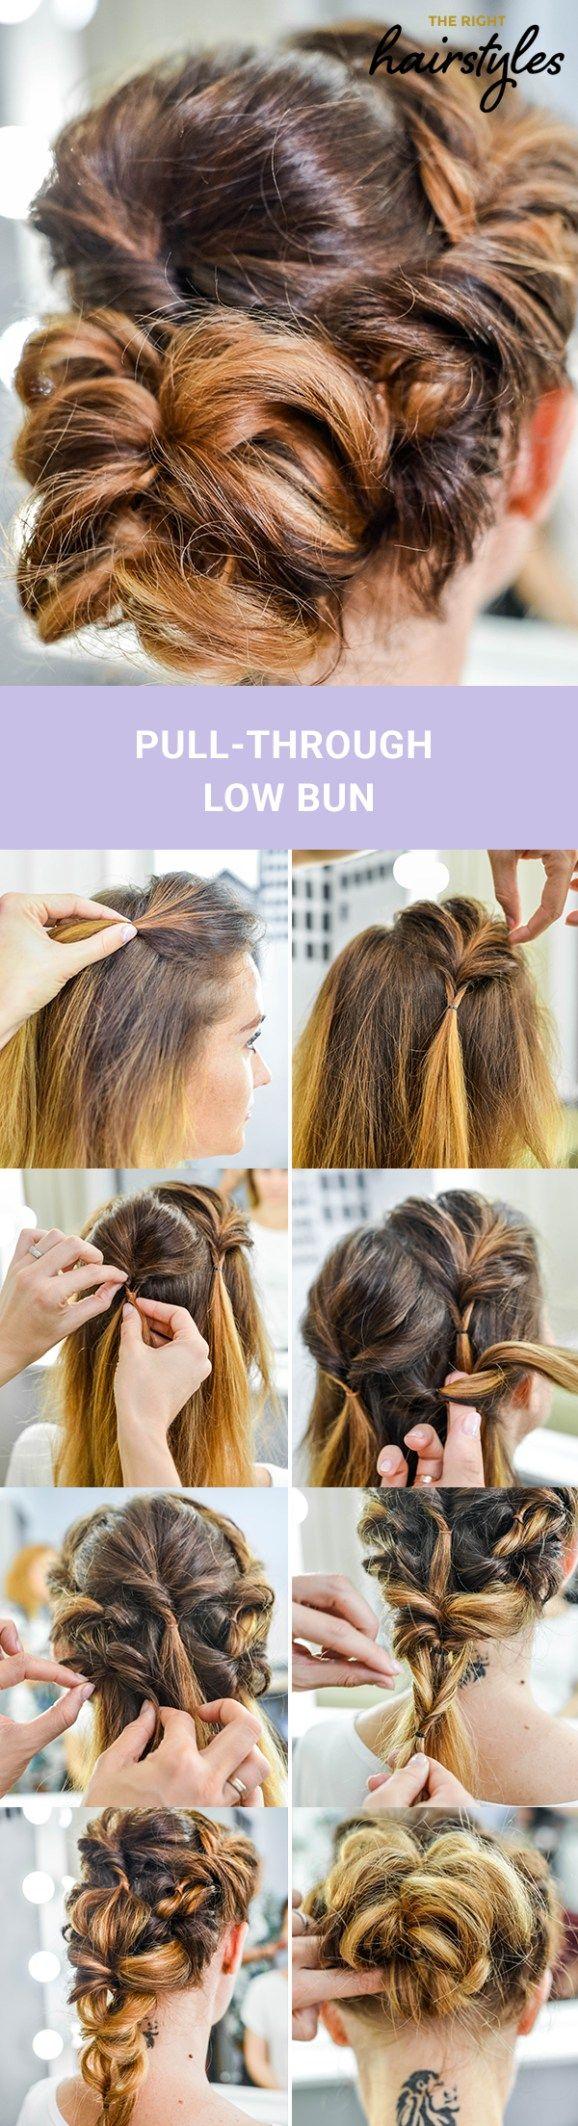 lovely bun hairstyles for fine hair in wedding pinterest